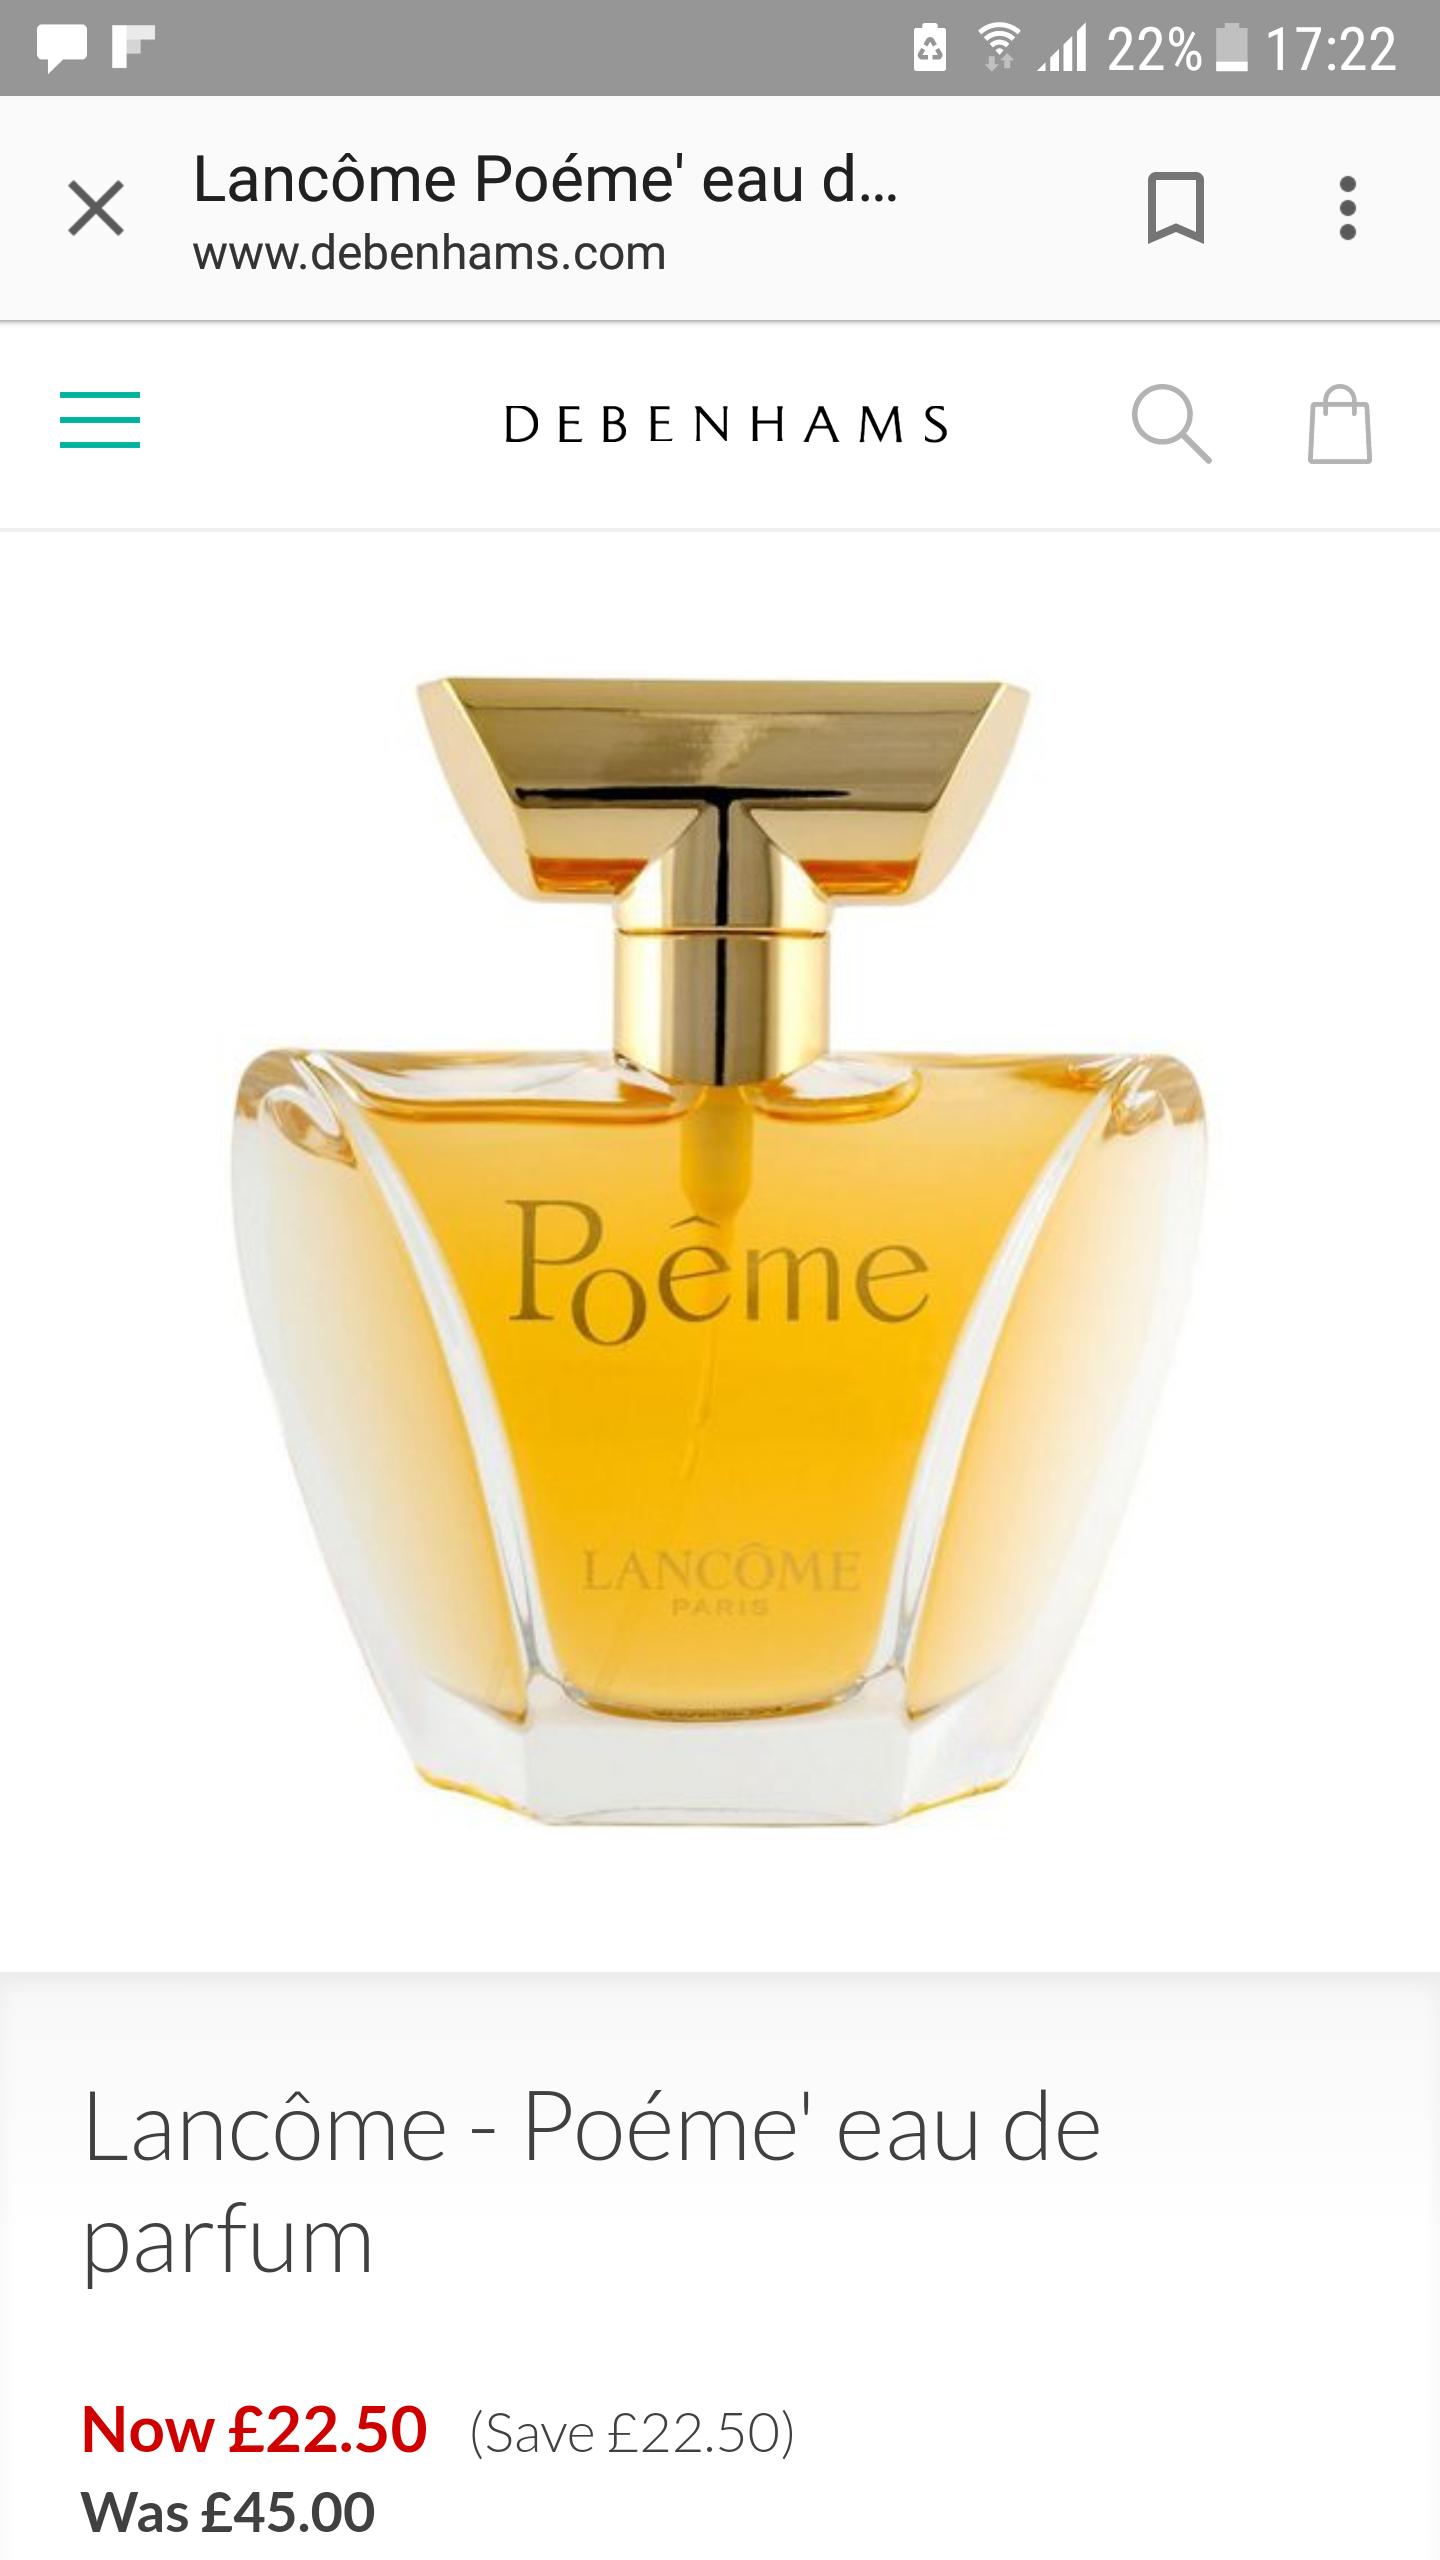 Poeme eau de parfum Lancome 30ml £22.50 @ Debenhams - Free c&c